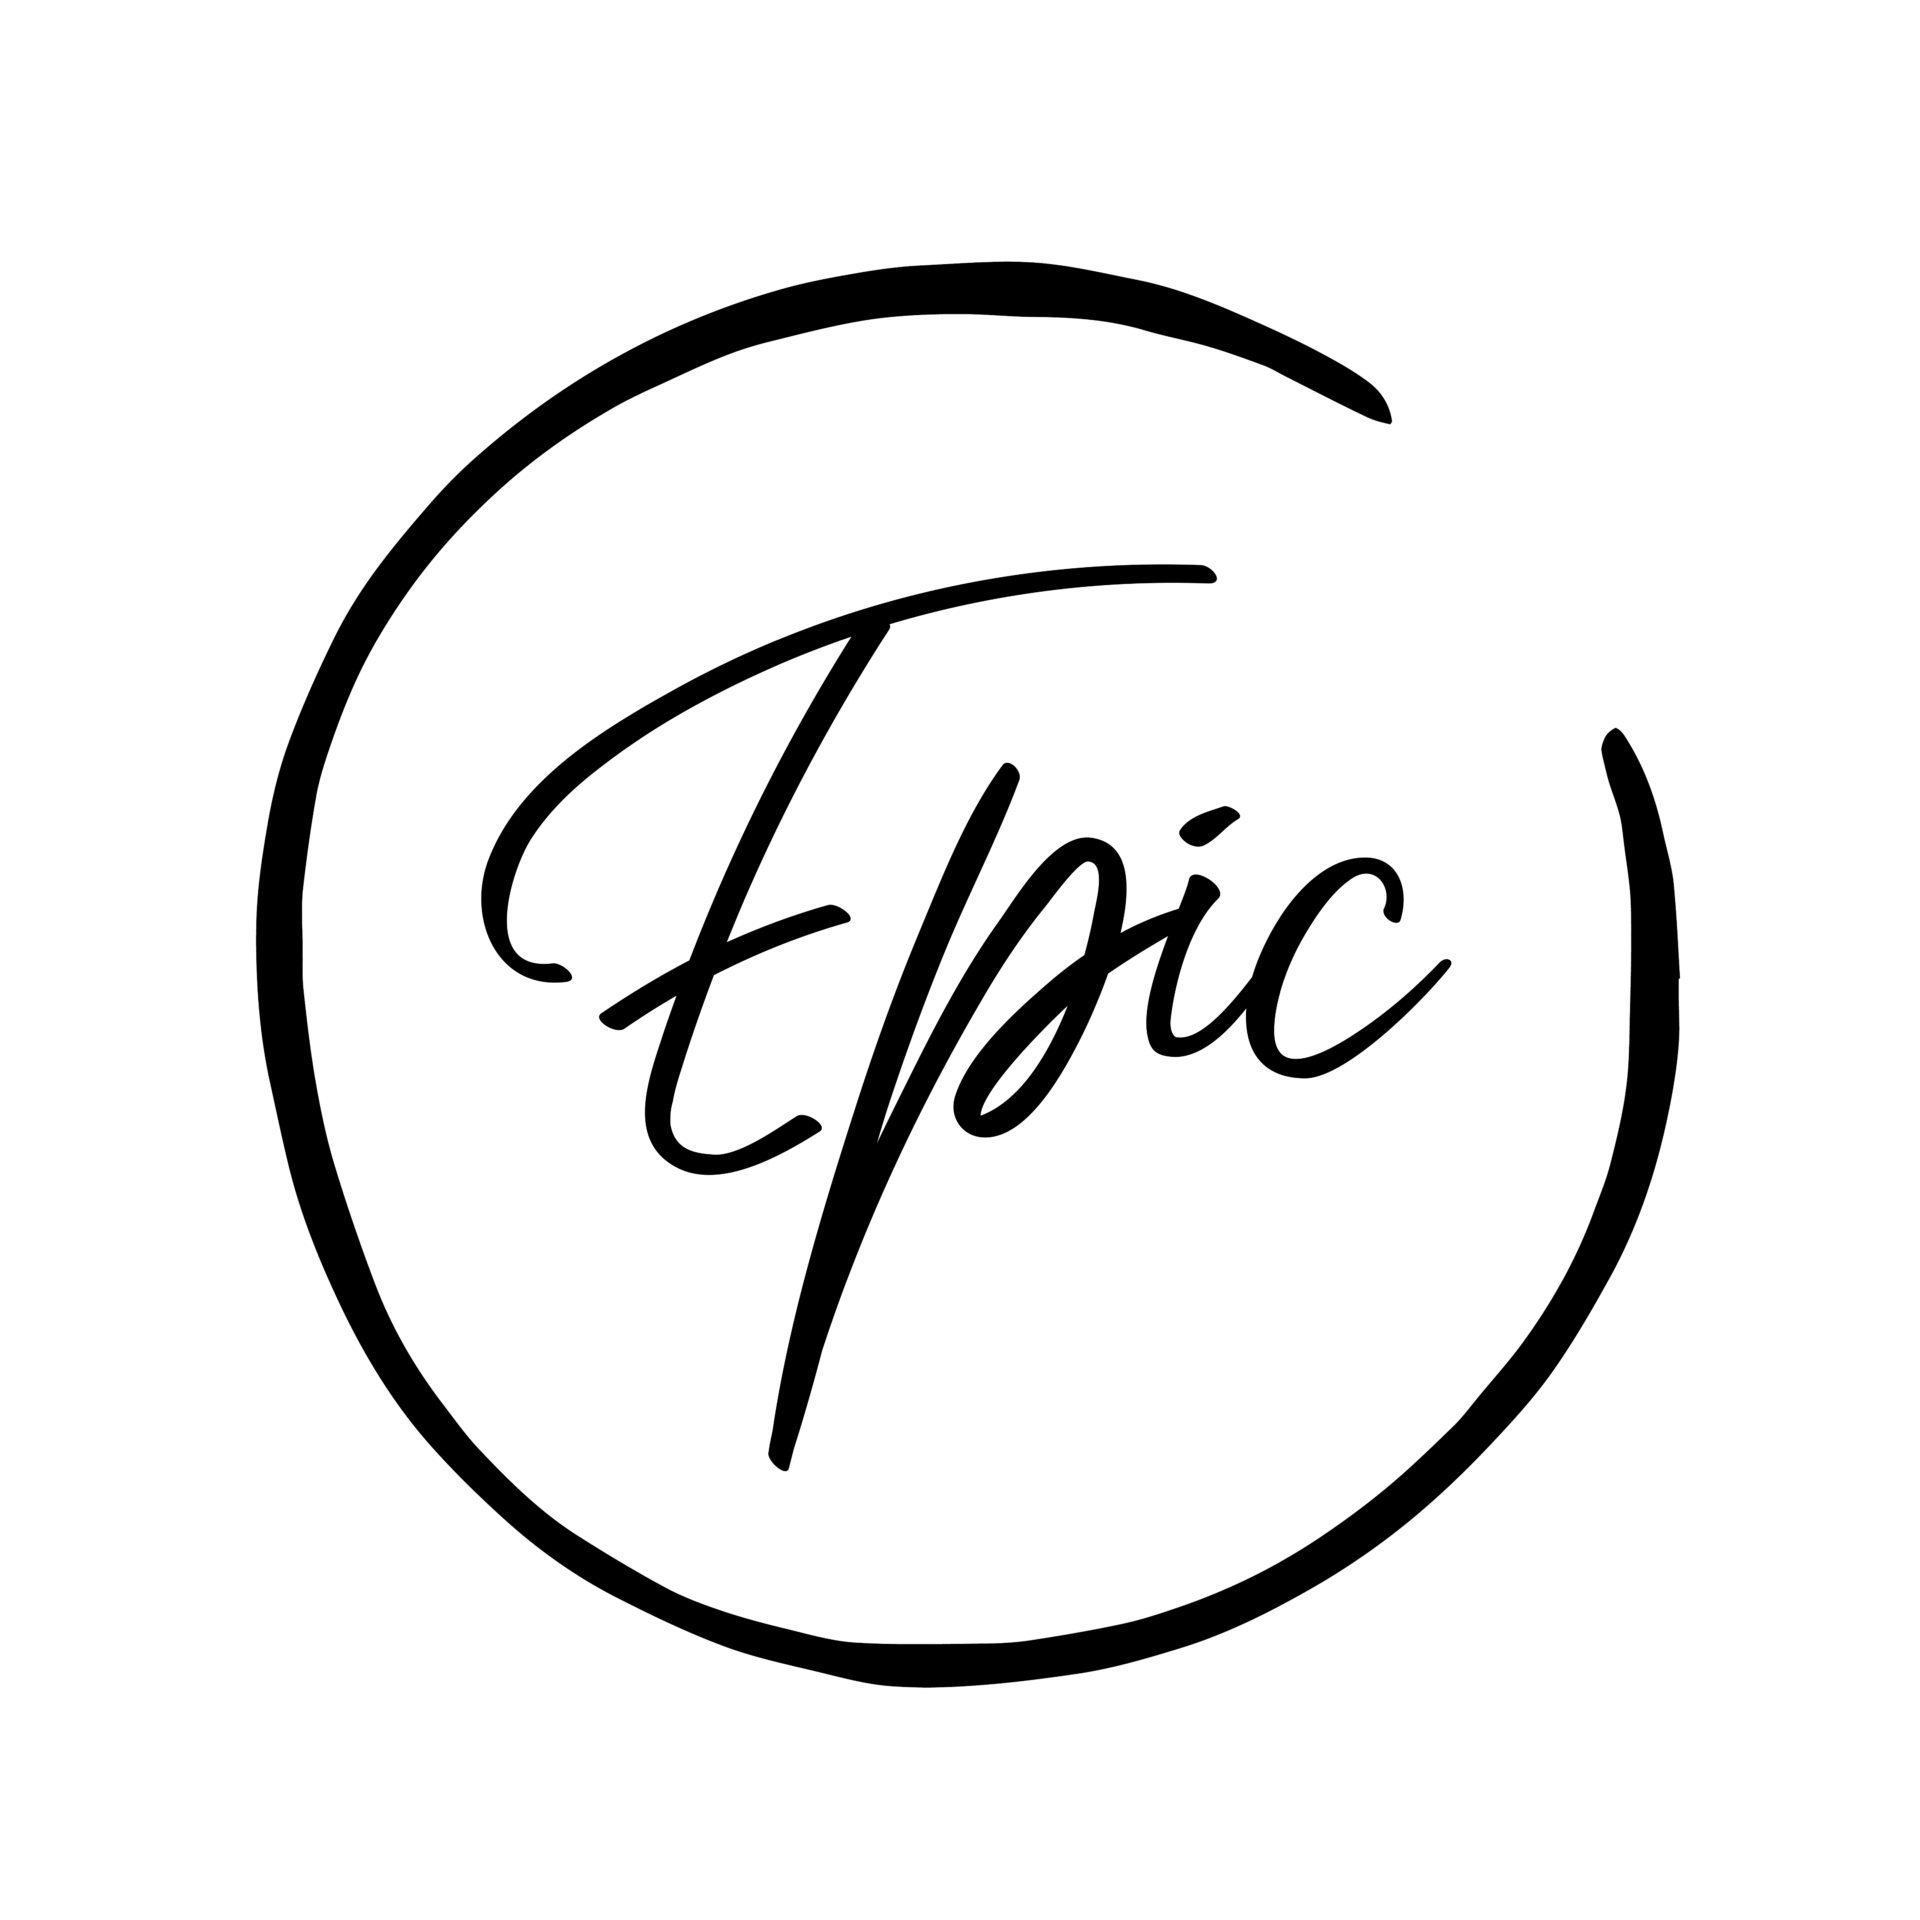 Image of the Epic Youth logo